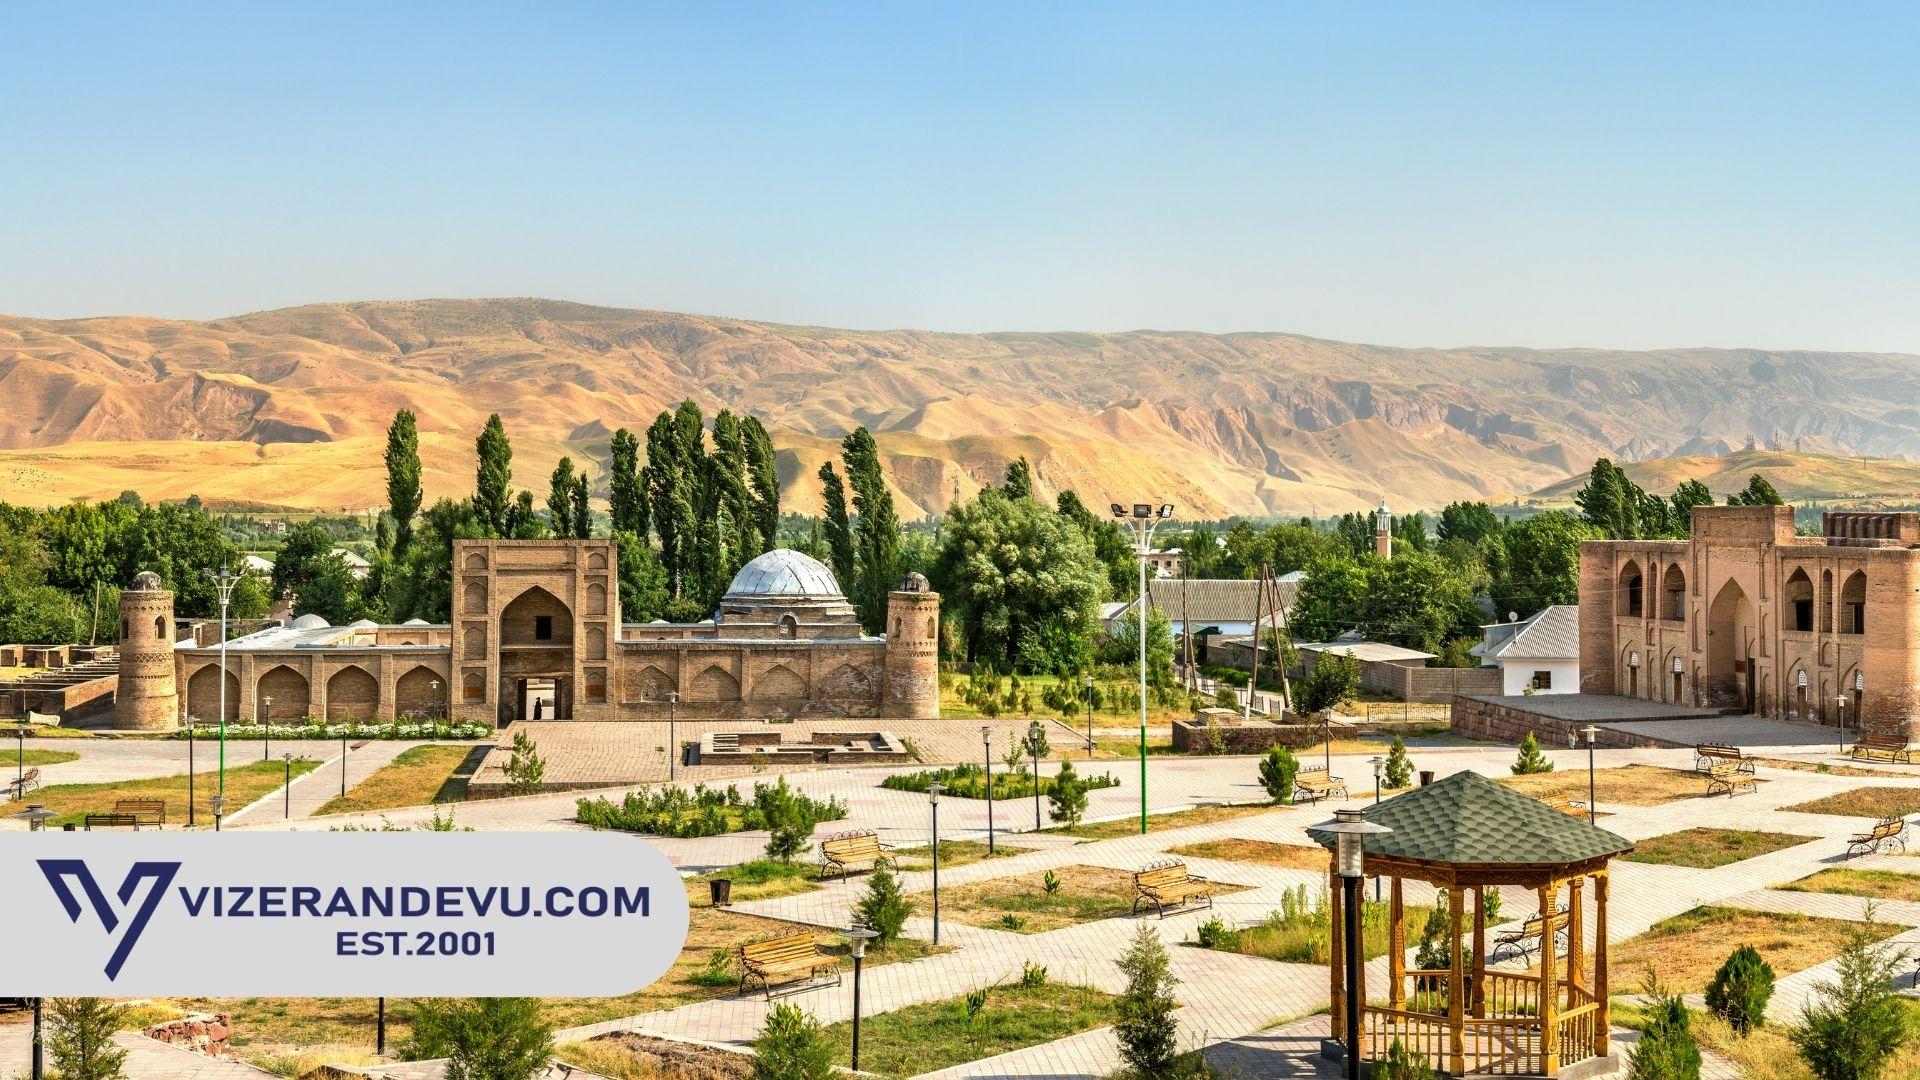 Tacikistan Vizesi: Randevu ve Başvuru (2021)